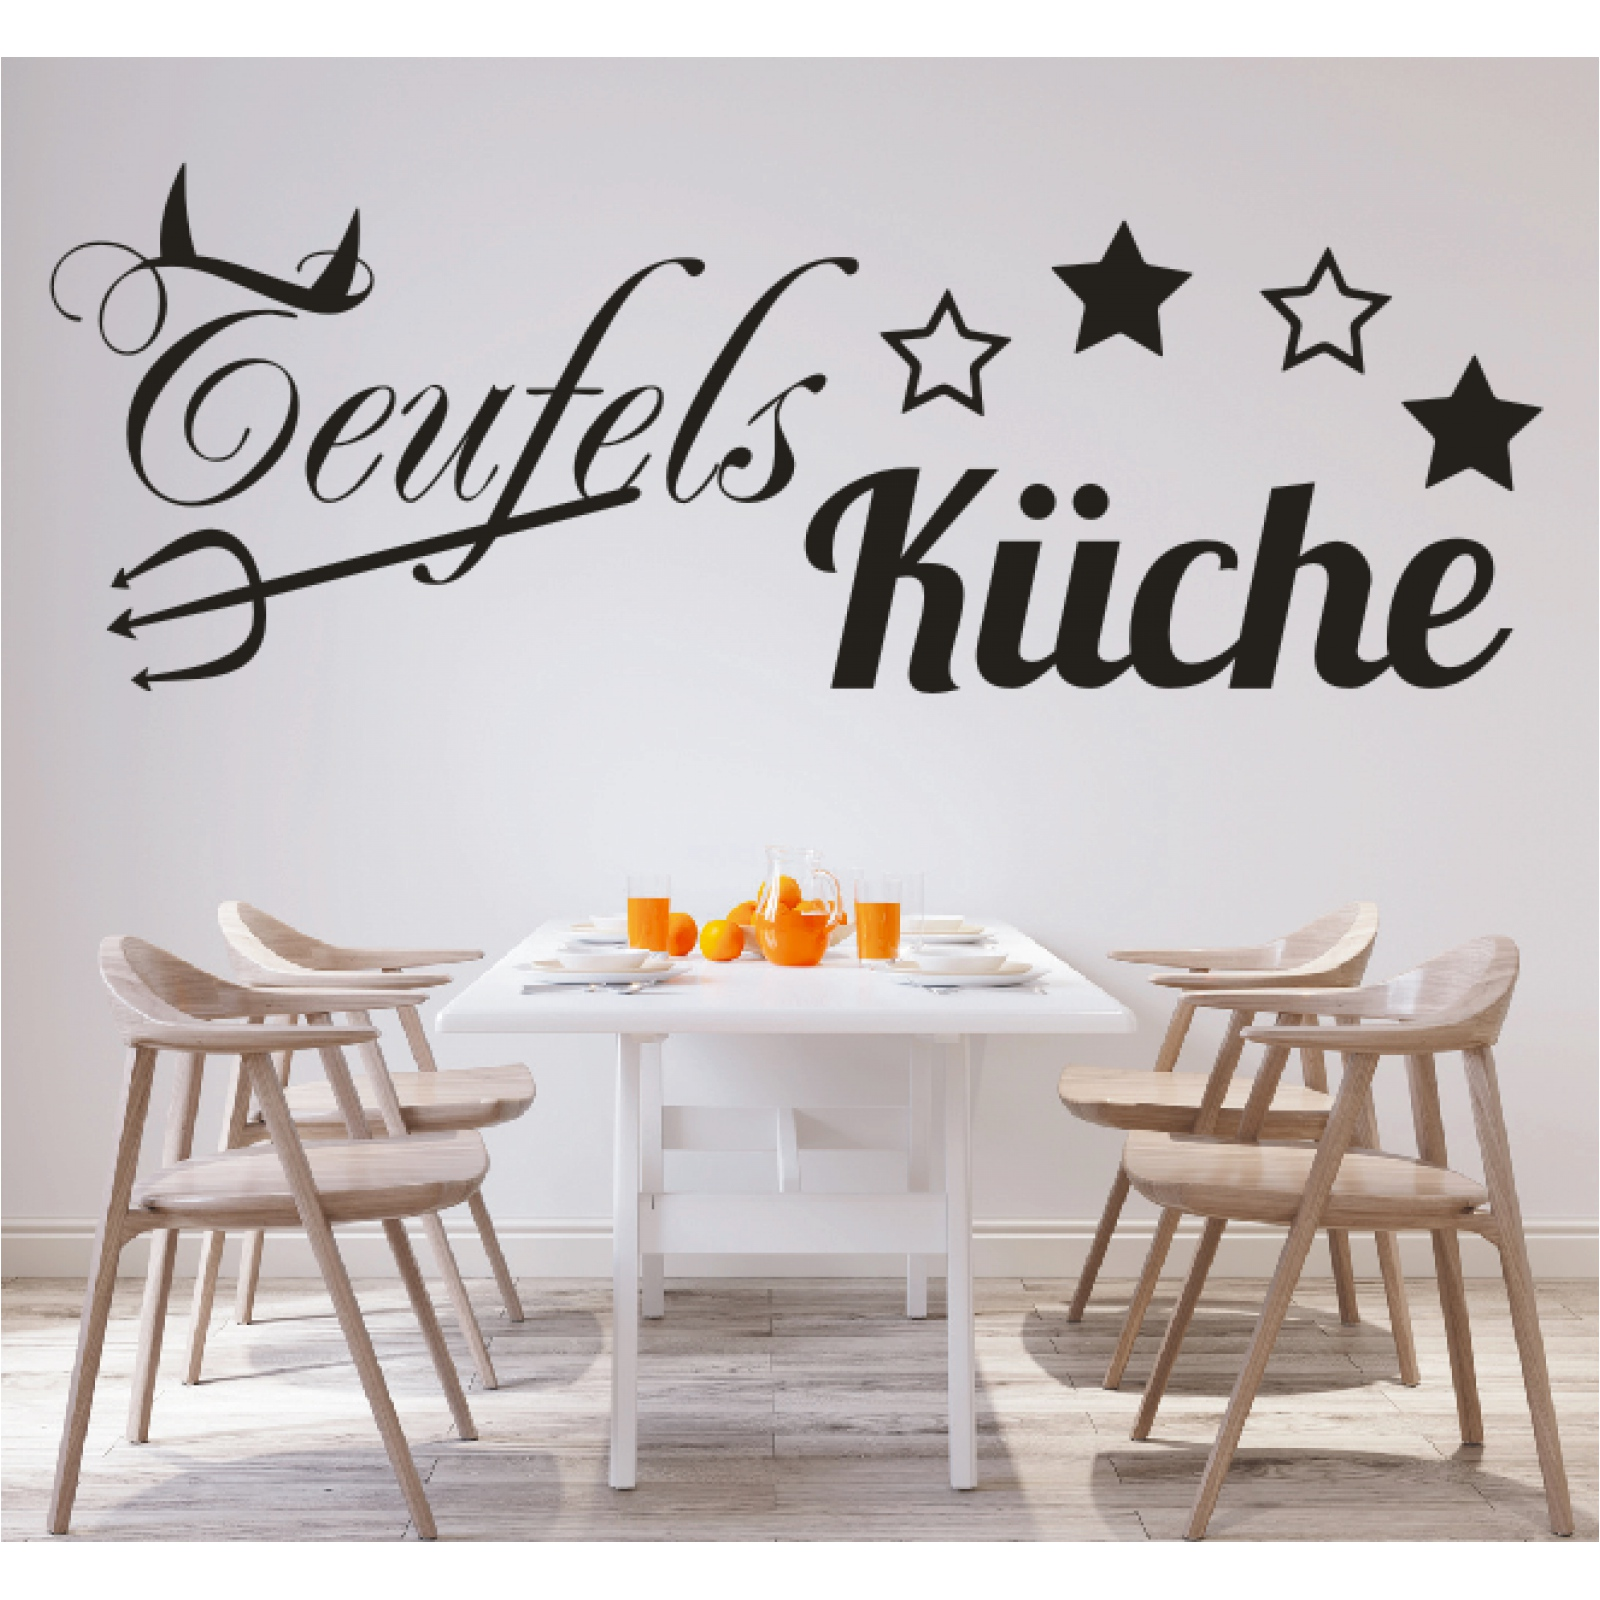 Spruch WANDTATTOO Teufels Küche Sticker Wandsticker Aufkleber Wandaufkleber